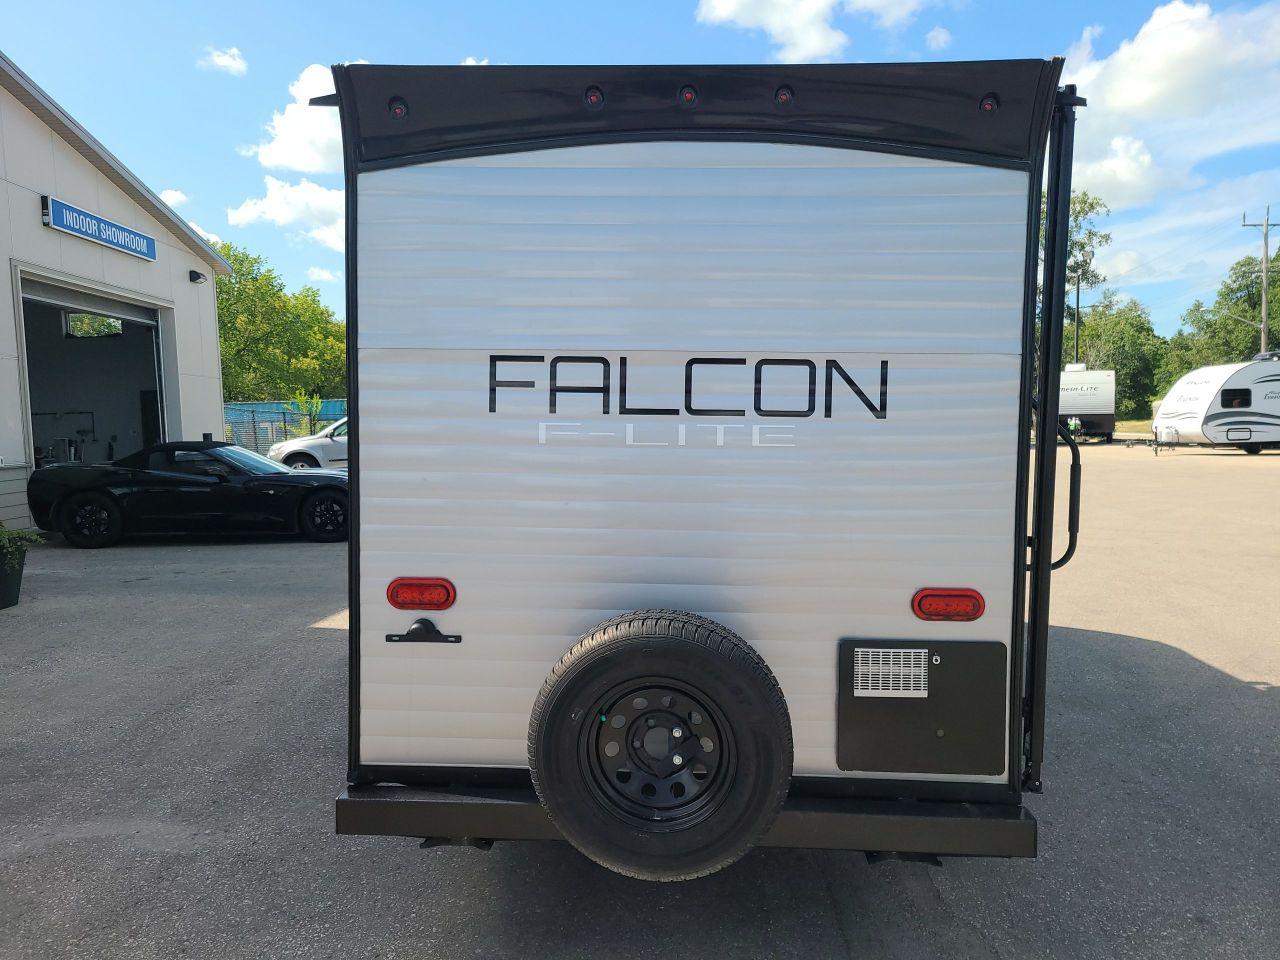 2020 Travel Lite Falcon Lite